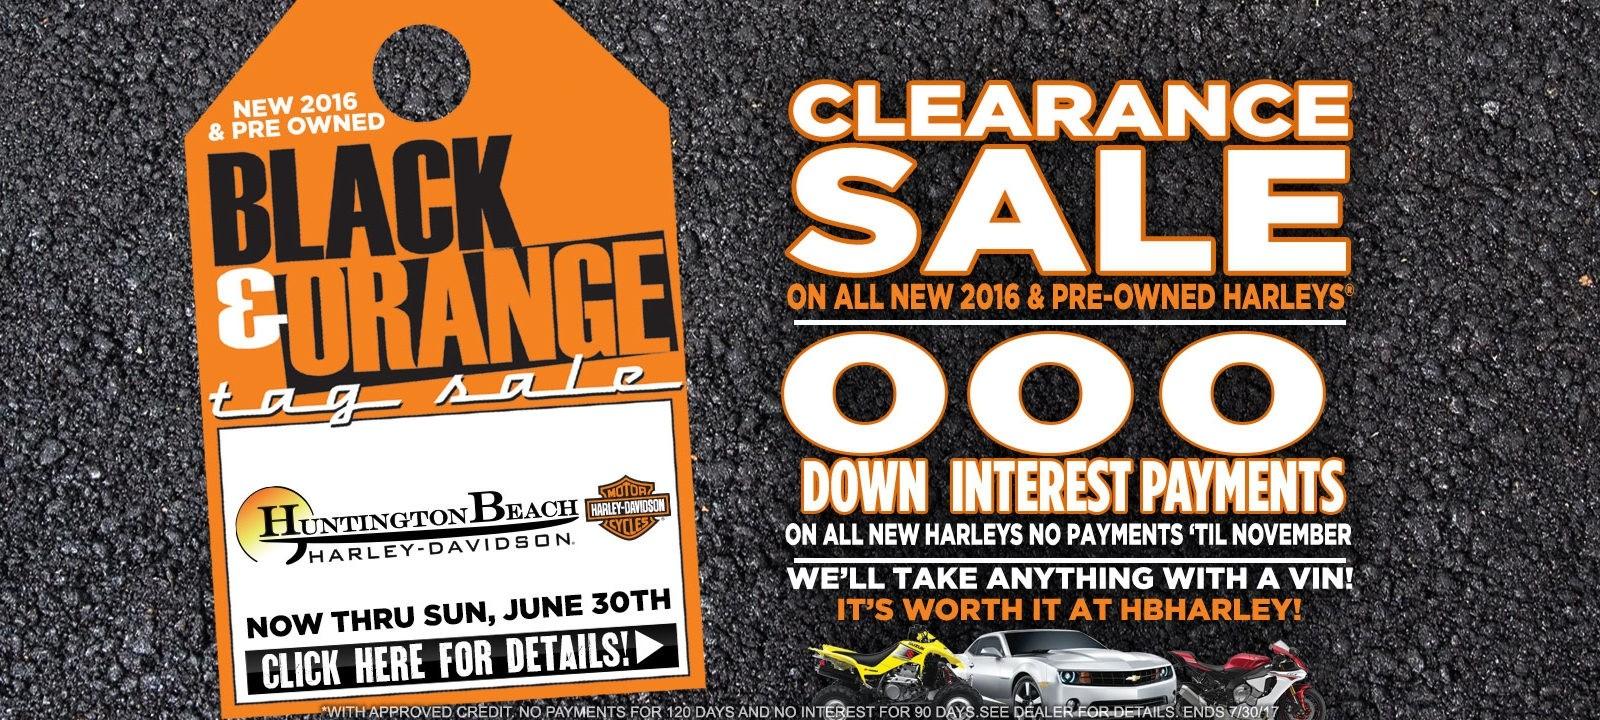 20170724-HBHD-1800x720-Black-&-Orange-Tag-Sale